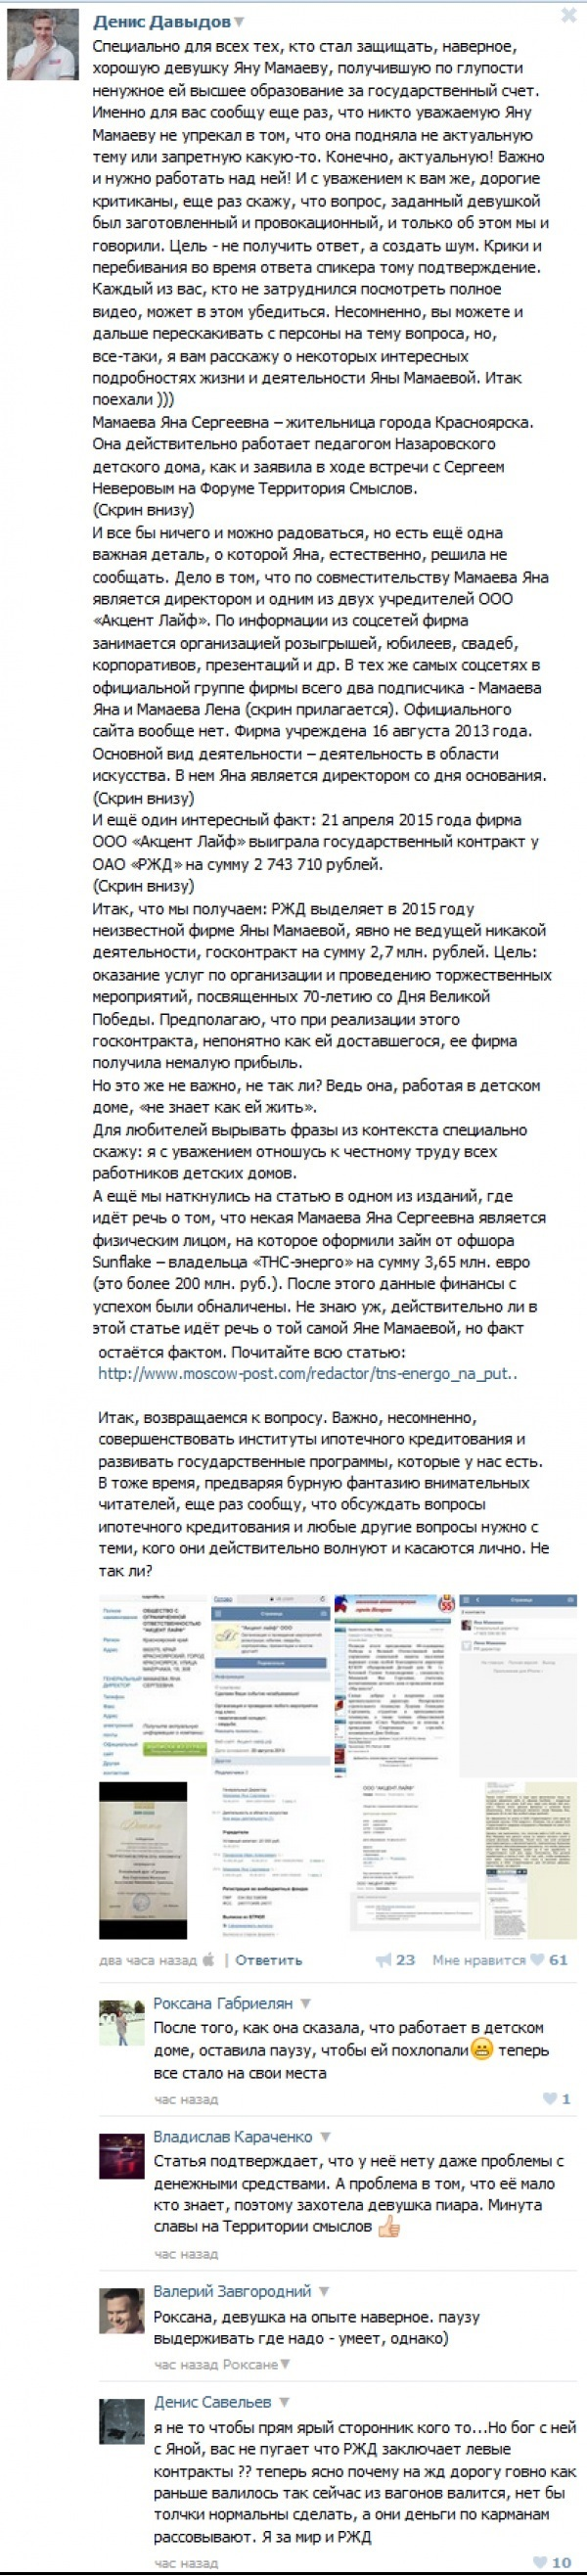 """Бедная девочка с iPhone 6"" Молодая гвардия, Тс2016, Текст, Видео, Длиннопост, Политика"